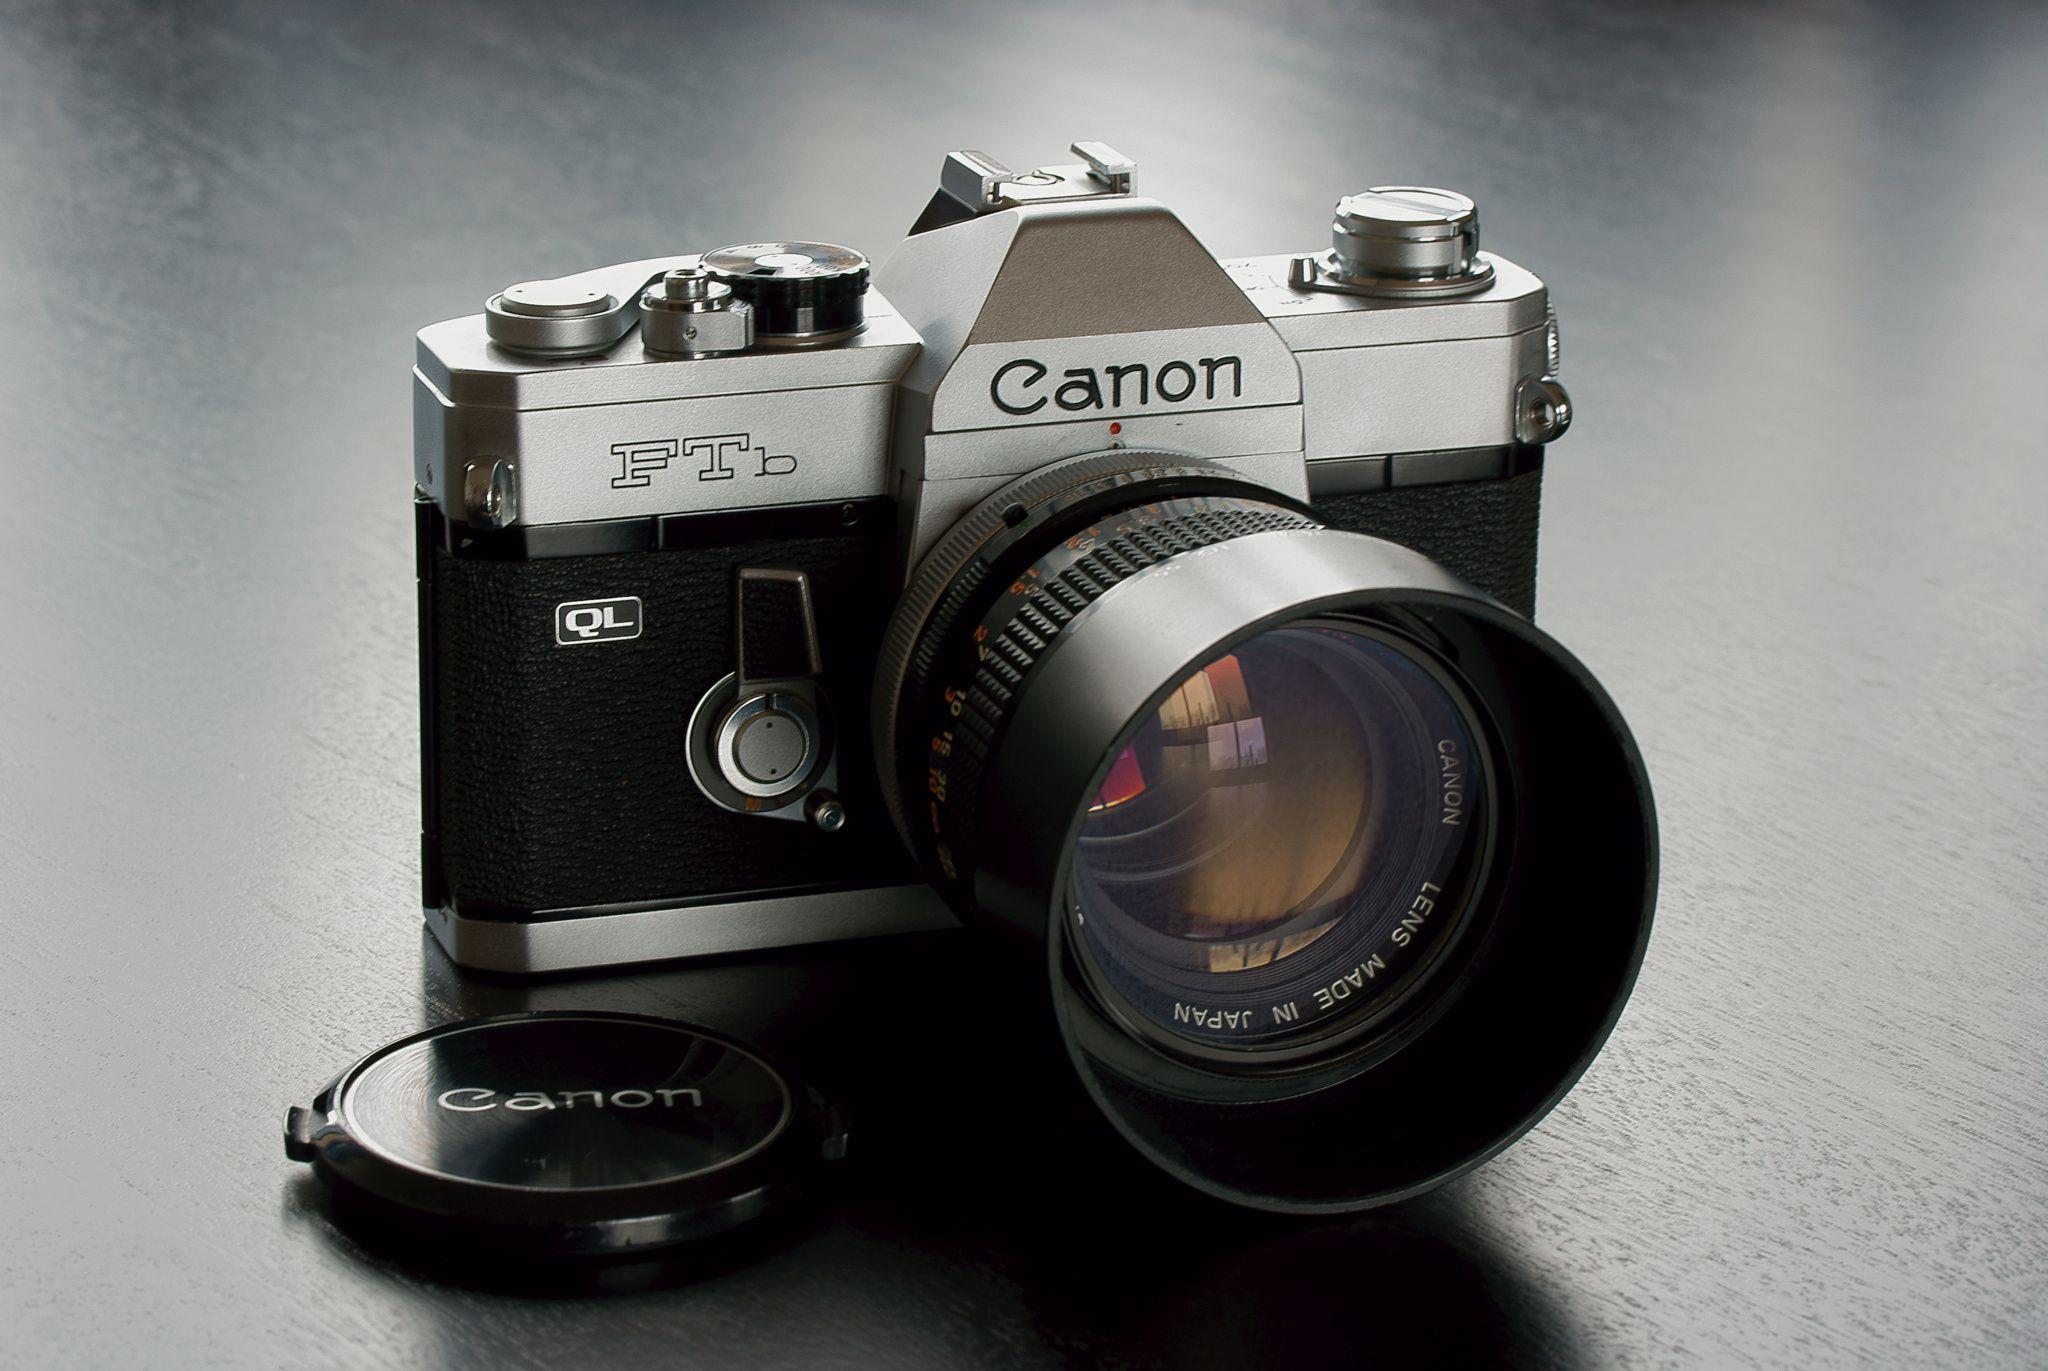 Canon FTb QL - SONY DSC